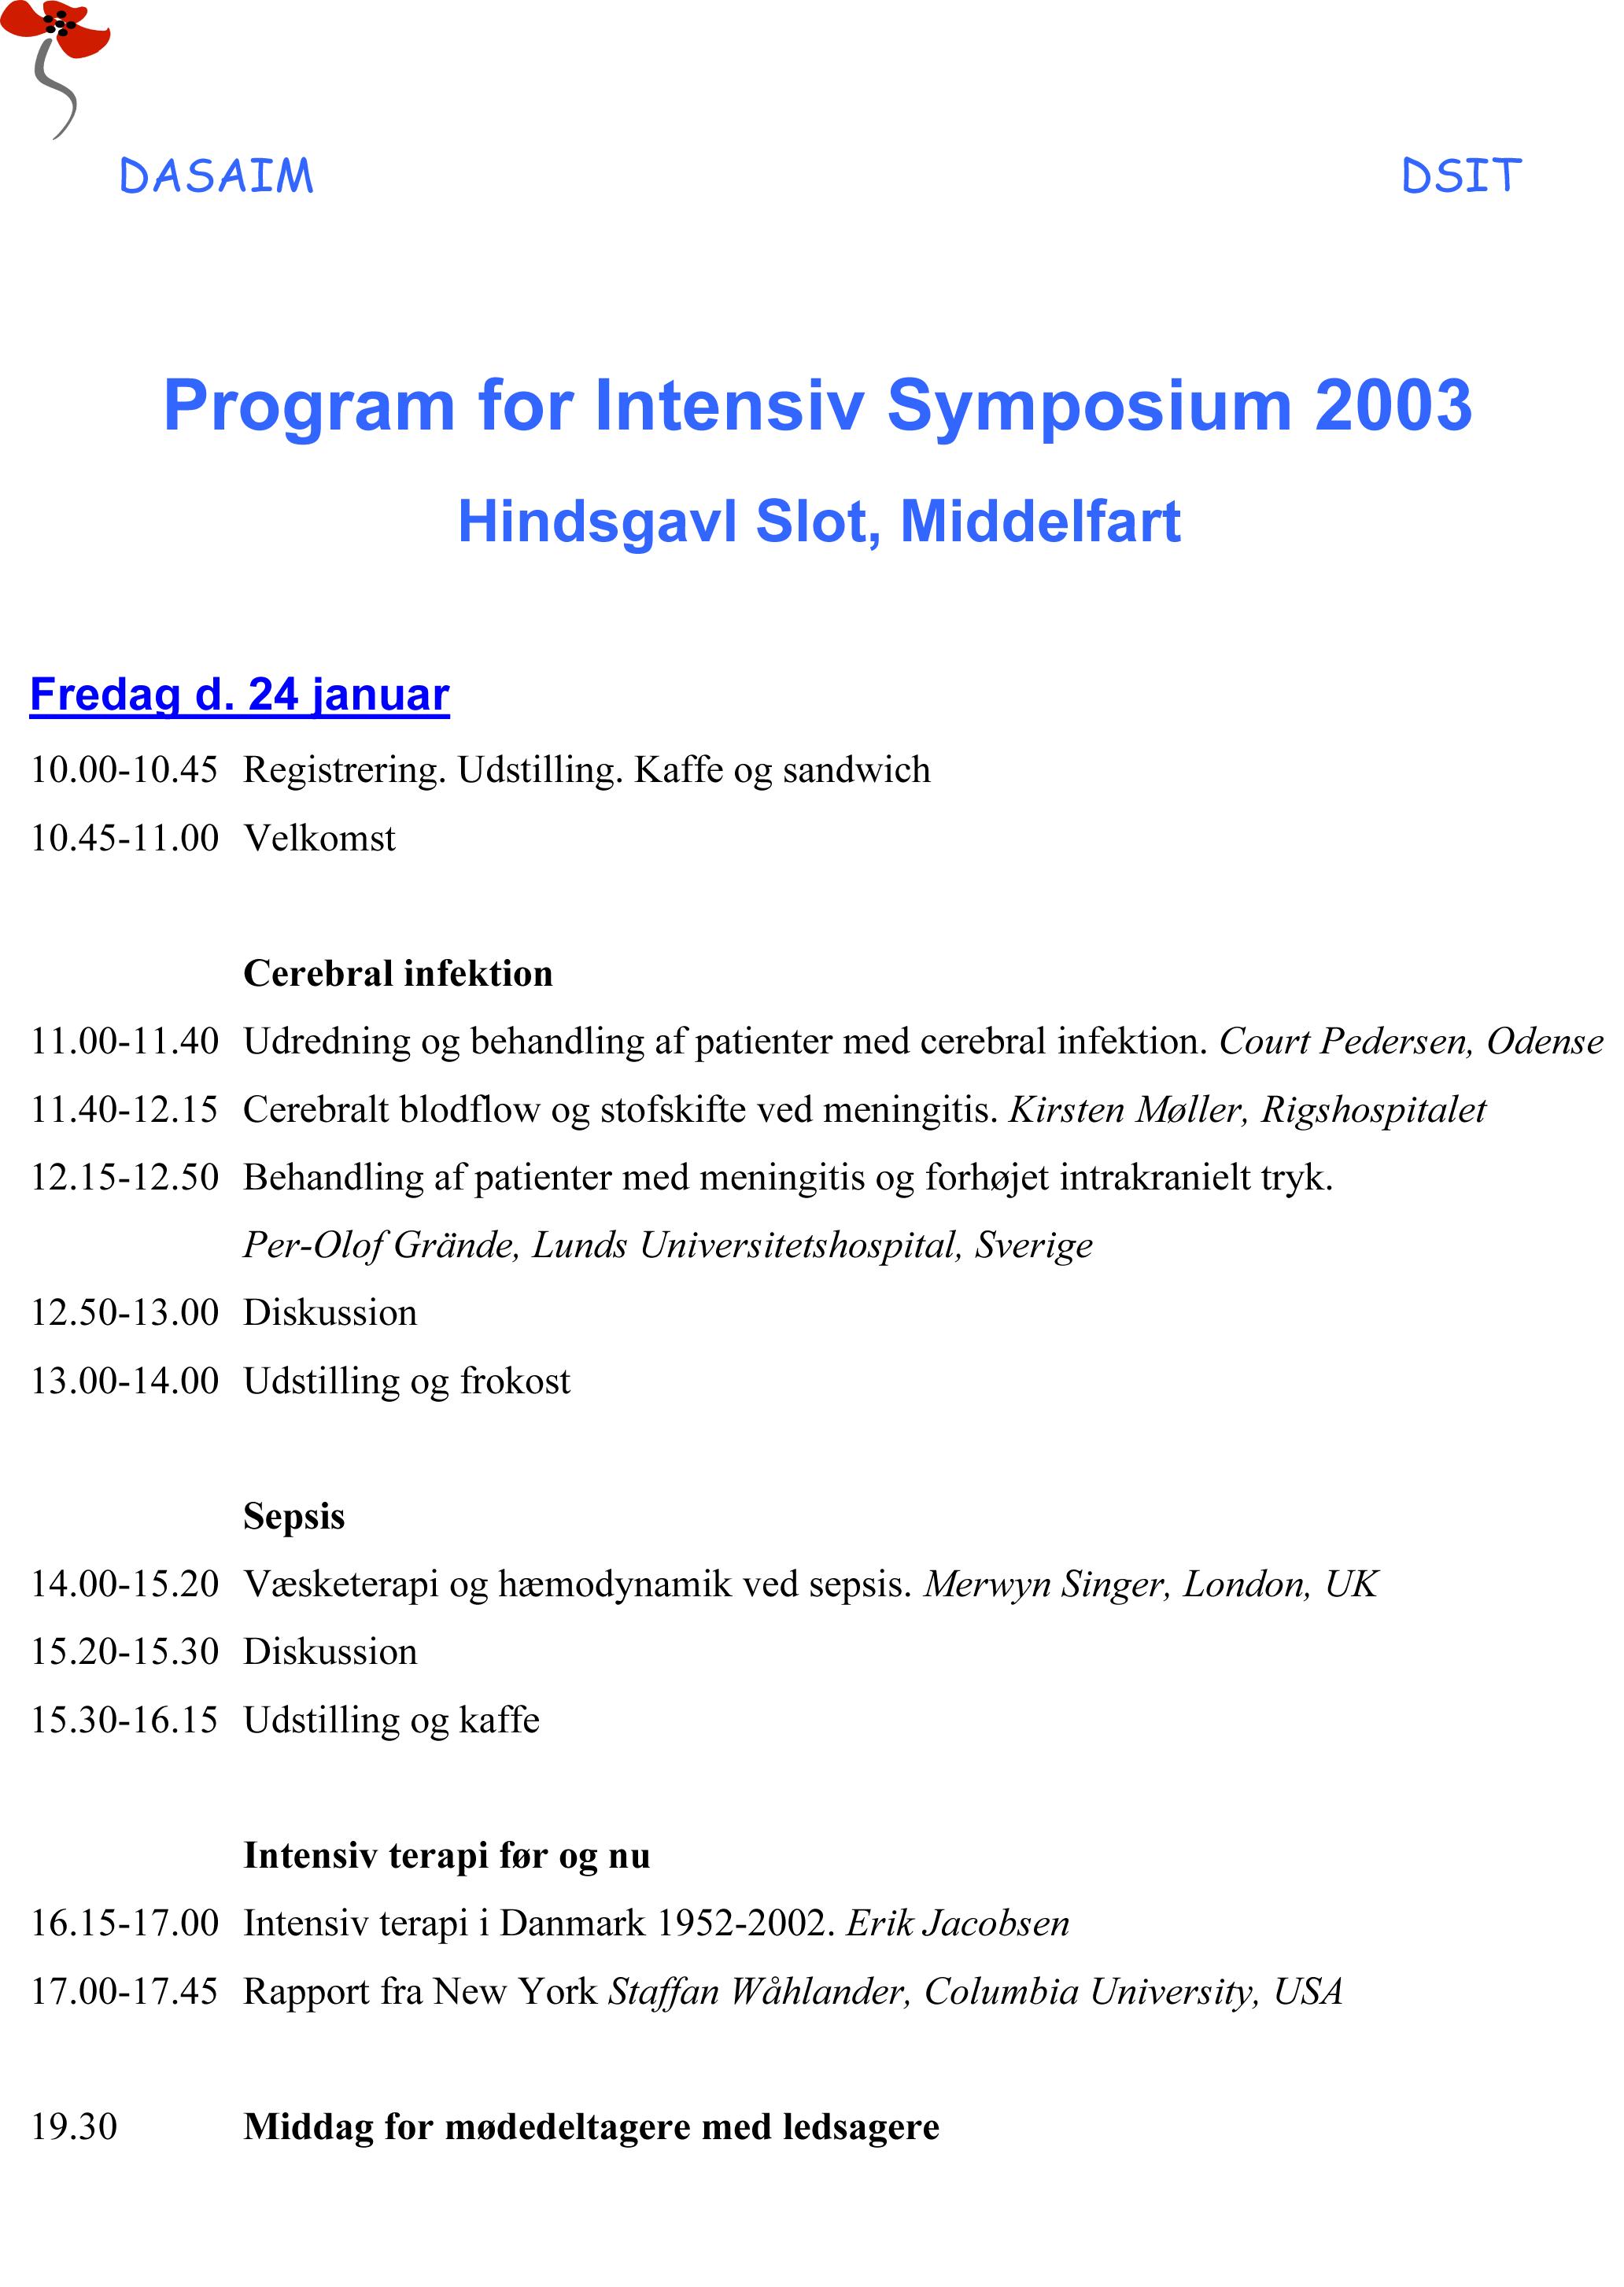 Program 2003